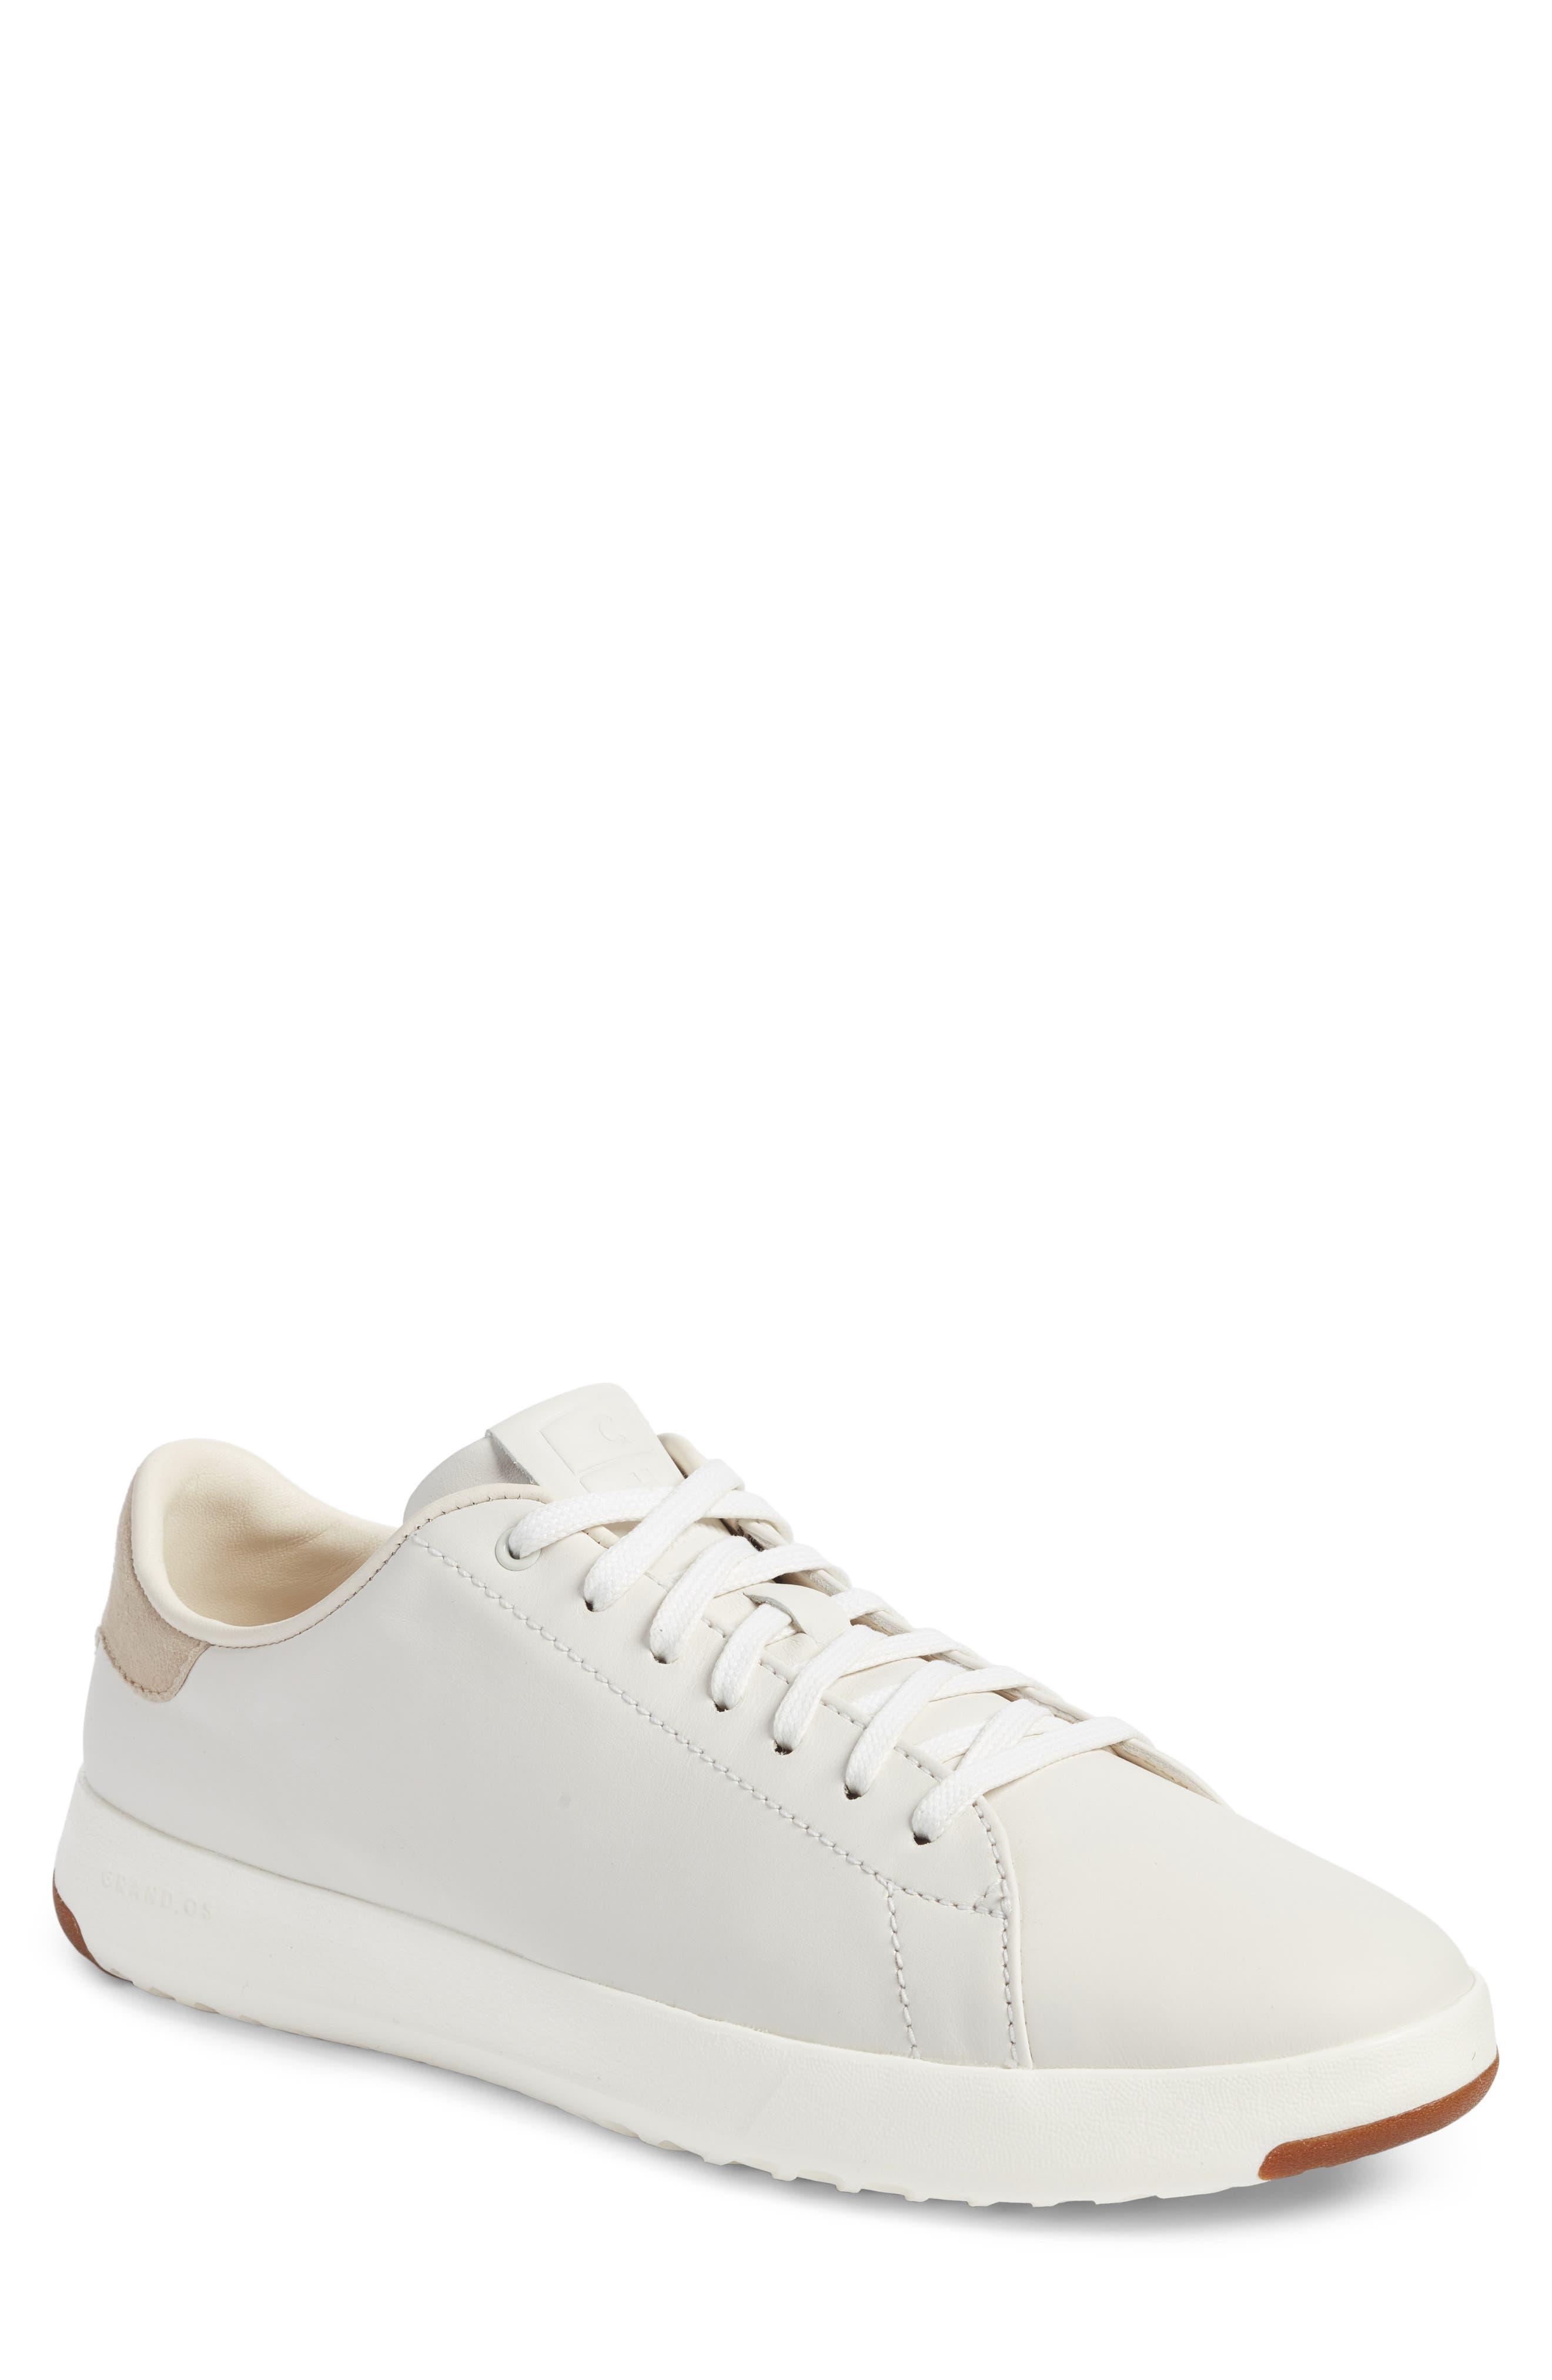 Men's Cole Haan Sneakers \u0026 Athletic